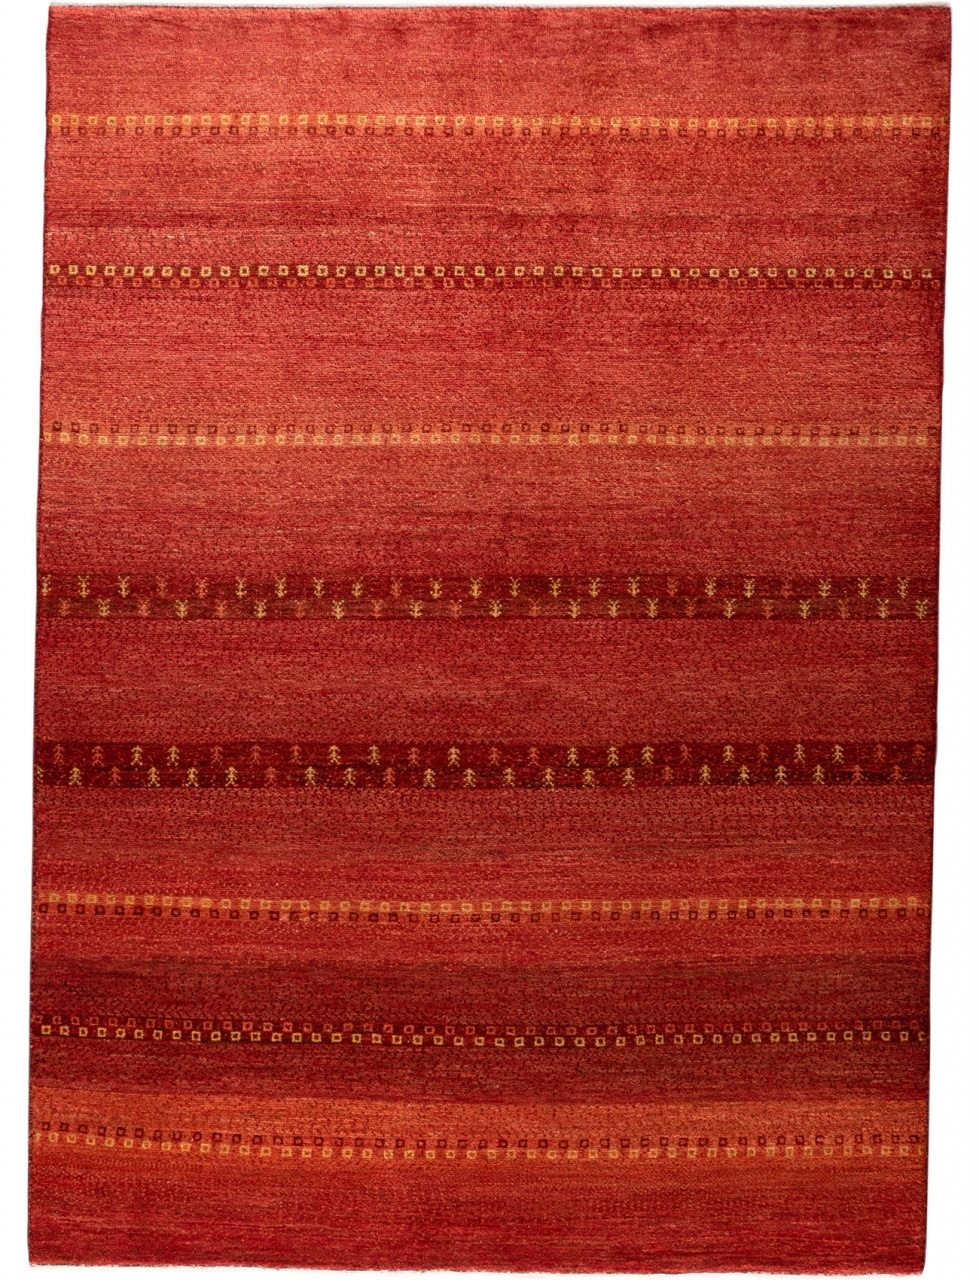 Iran Gabbeh Teppich-Unikat Red Sunshine